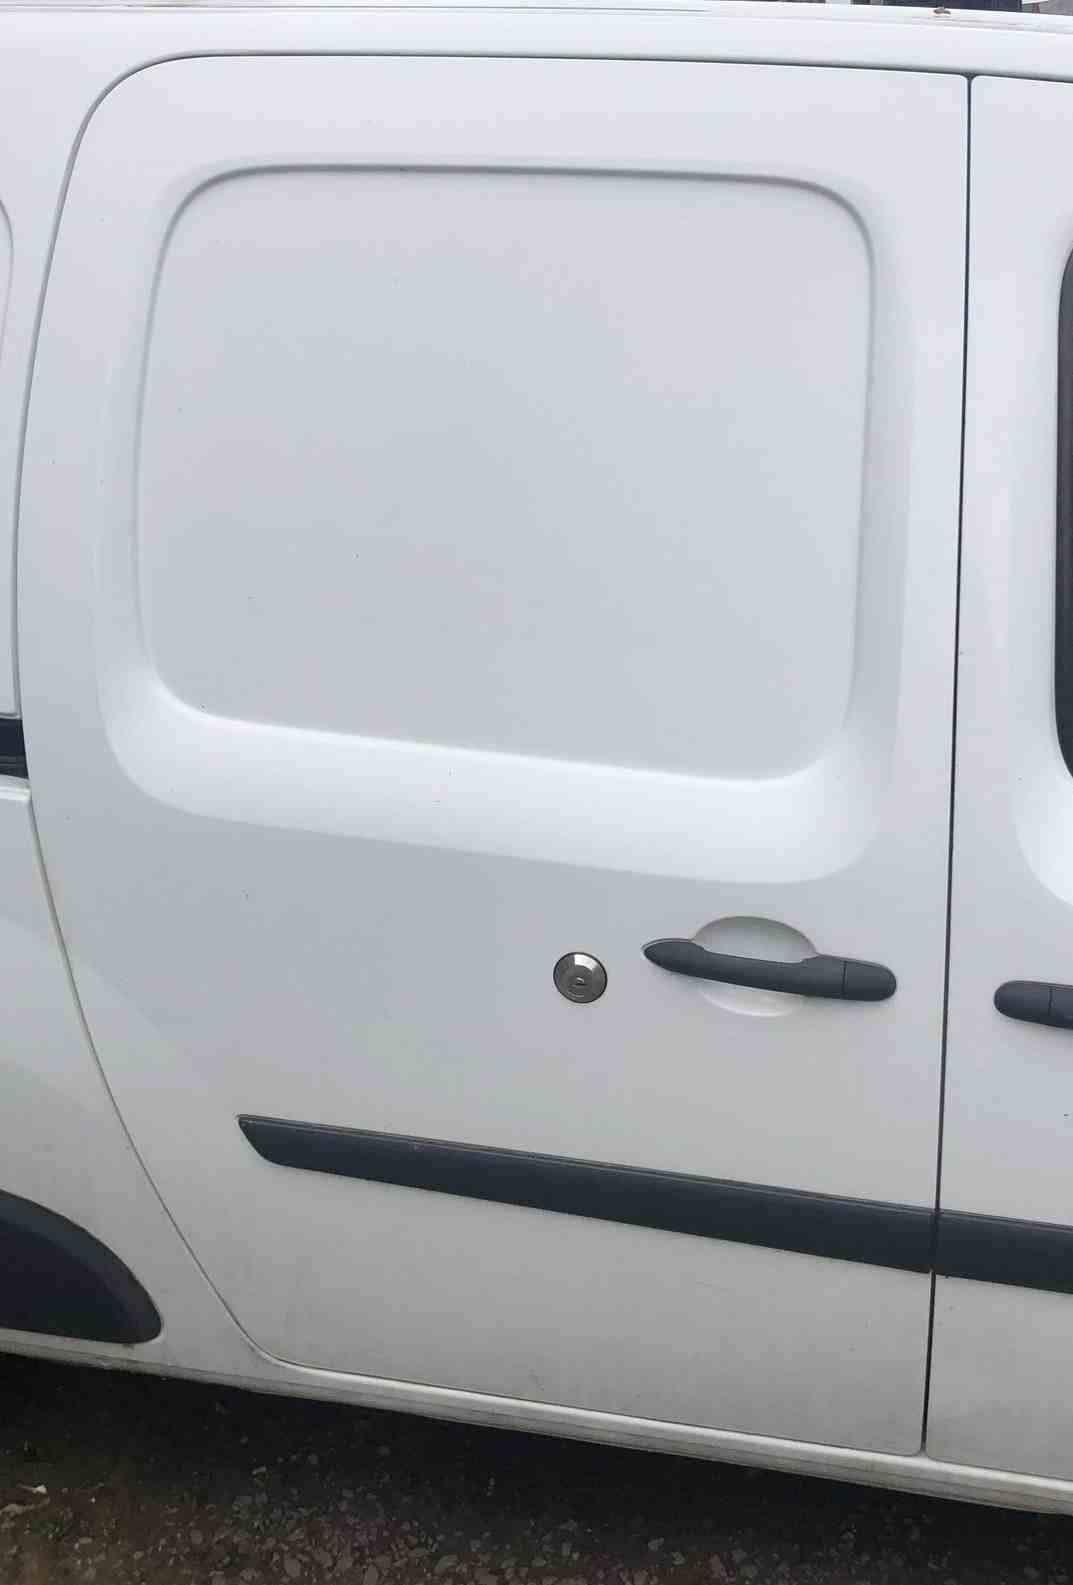 Renault Kangoo Maxi 2007-2017 Drivers OS Sliding Door White OV389